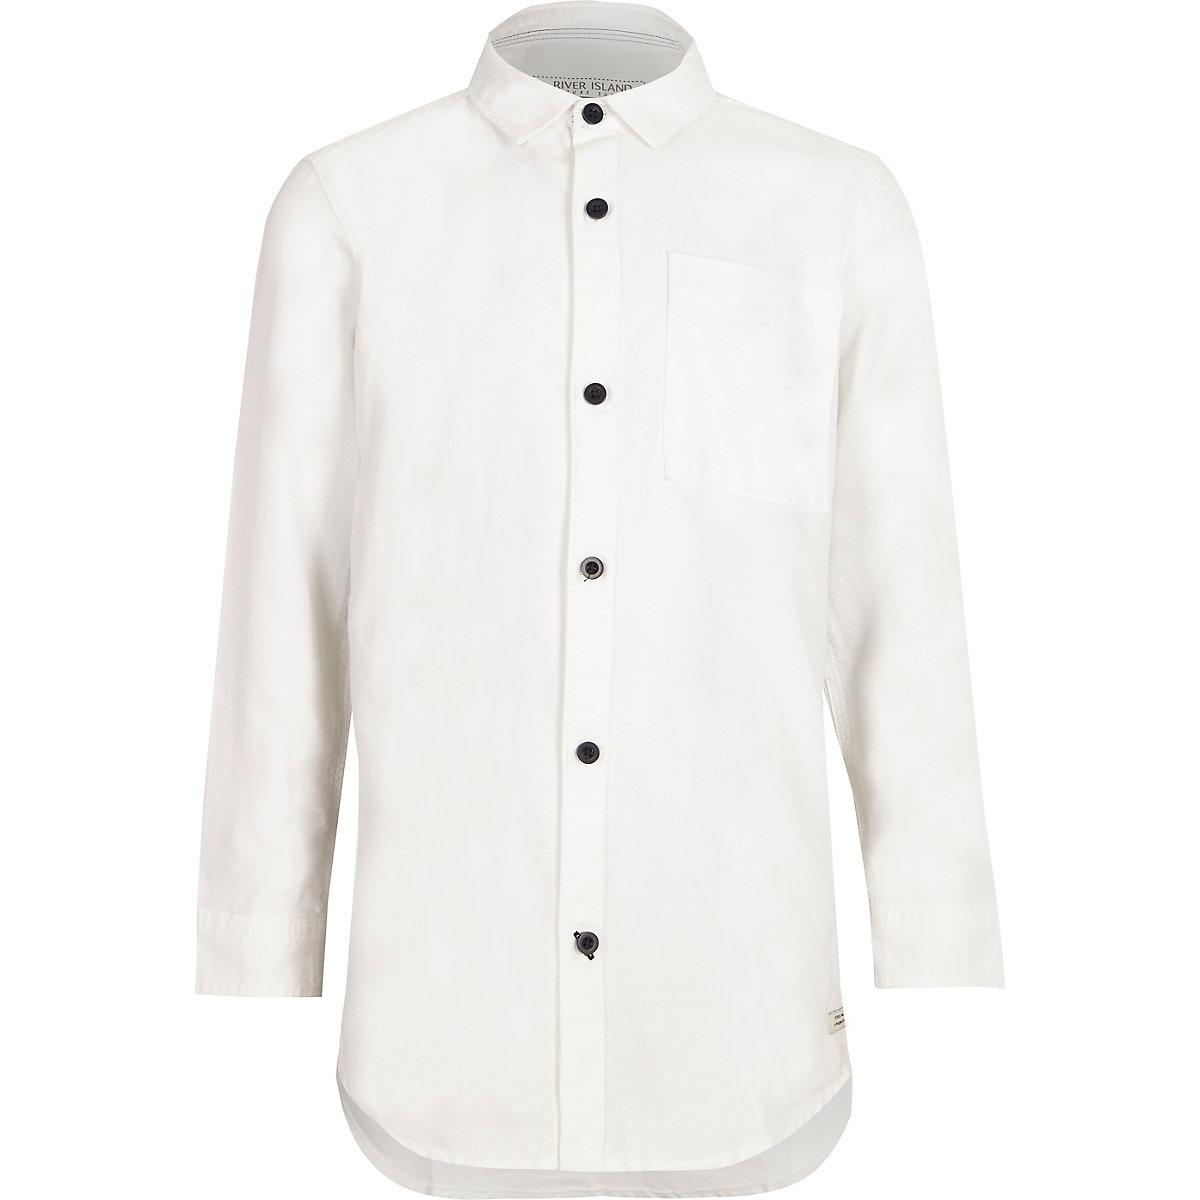 Boys white long sleeve Oxford shirt